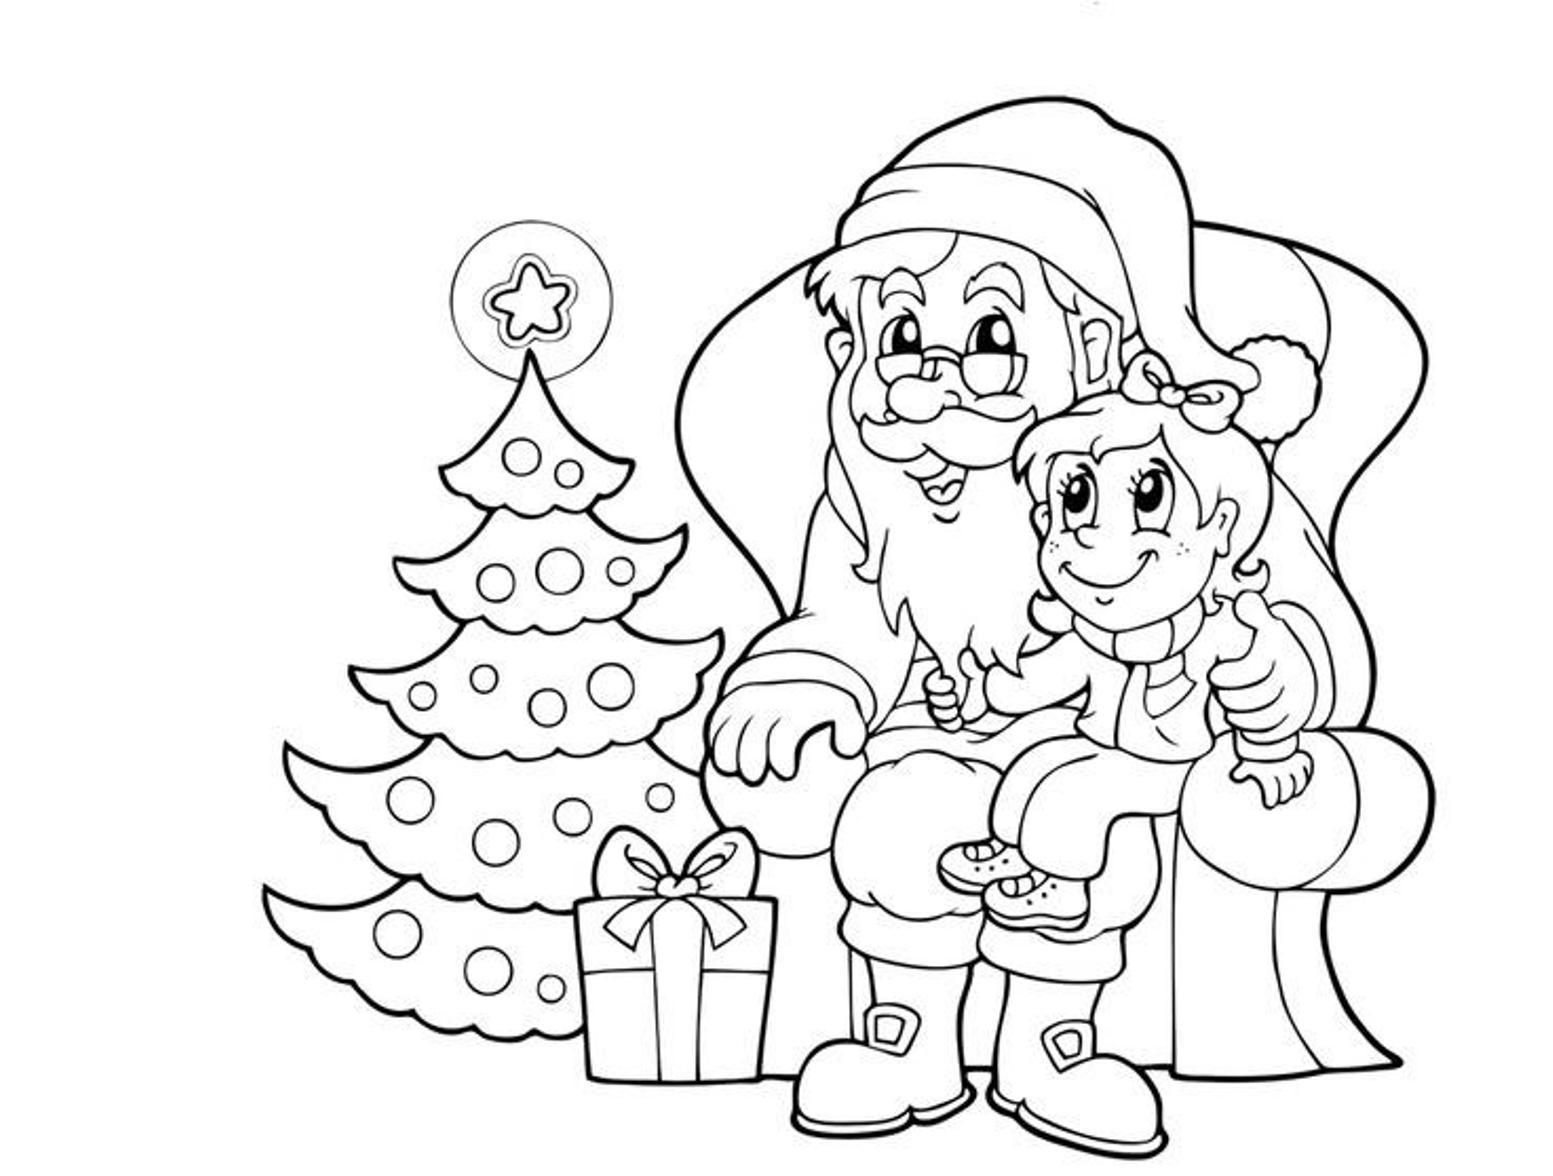 santa claus printable coloring pages free santa coloring pages and printables for kids coloring printable claus santa pages